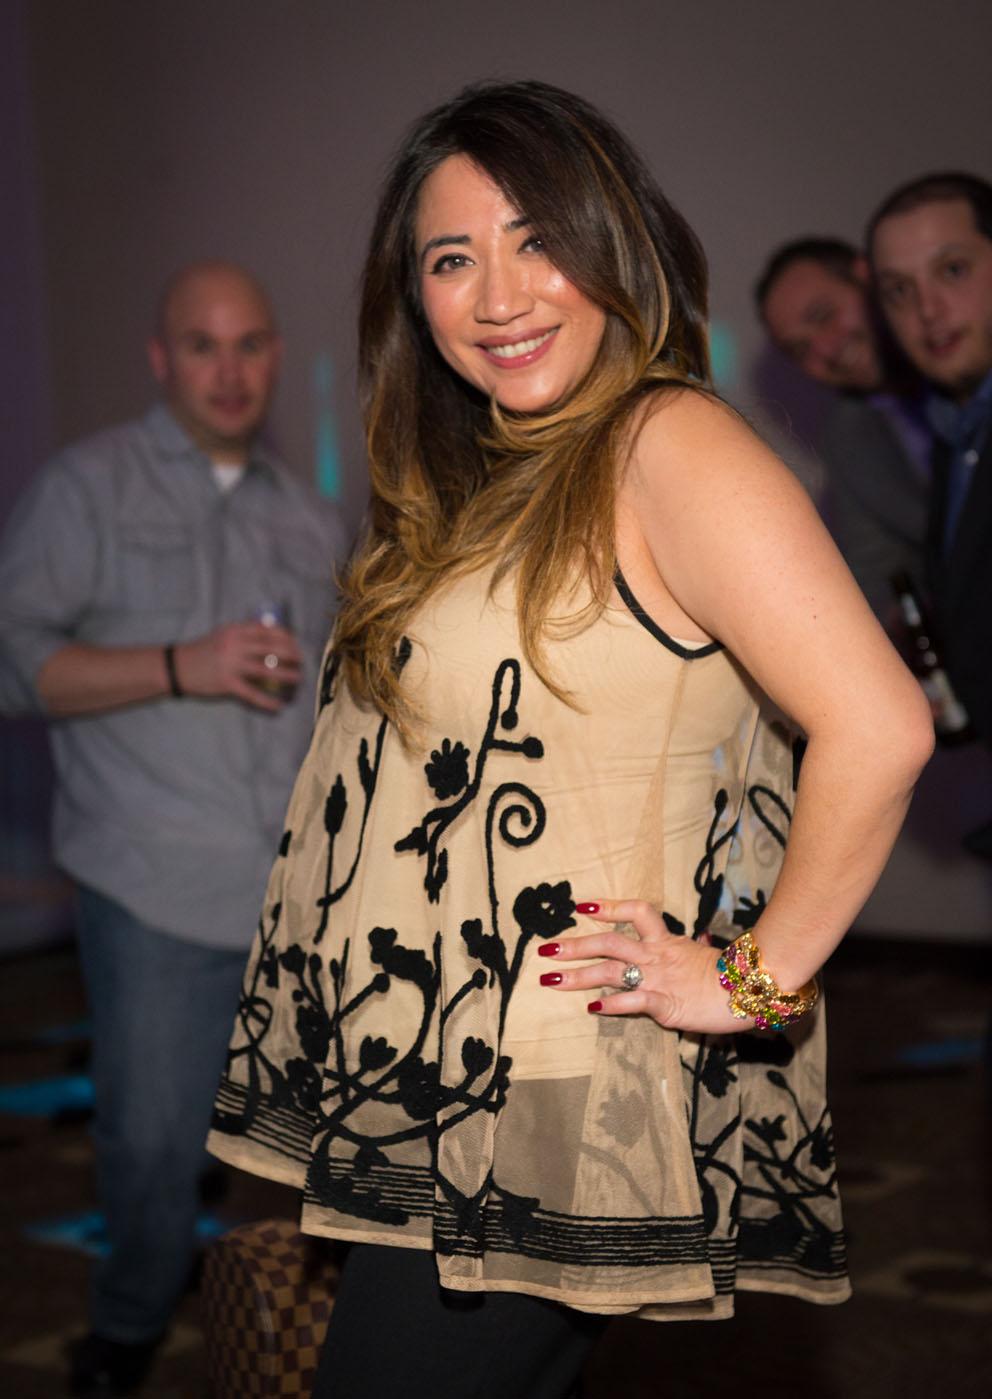 2015-12-09 ReMax Corpoarte Event - The Borgata - Atlantic City NJ - Photo Sesh - 2015-5180.jpg